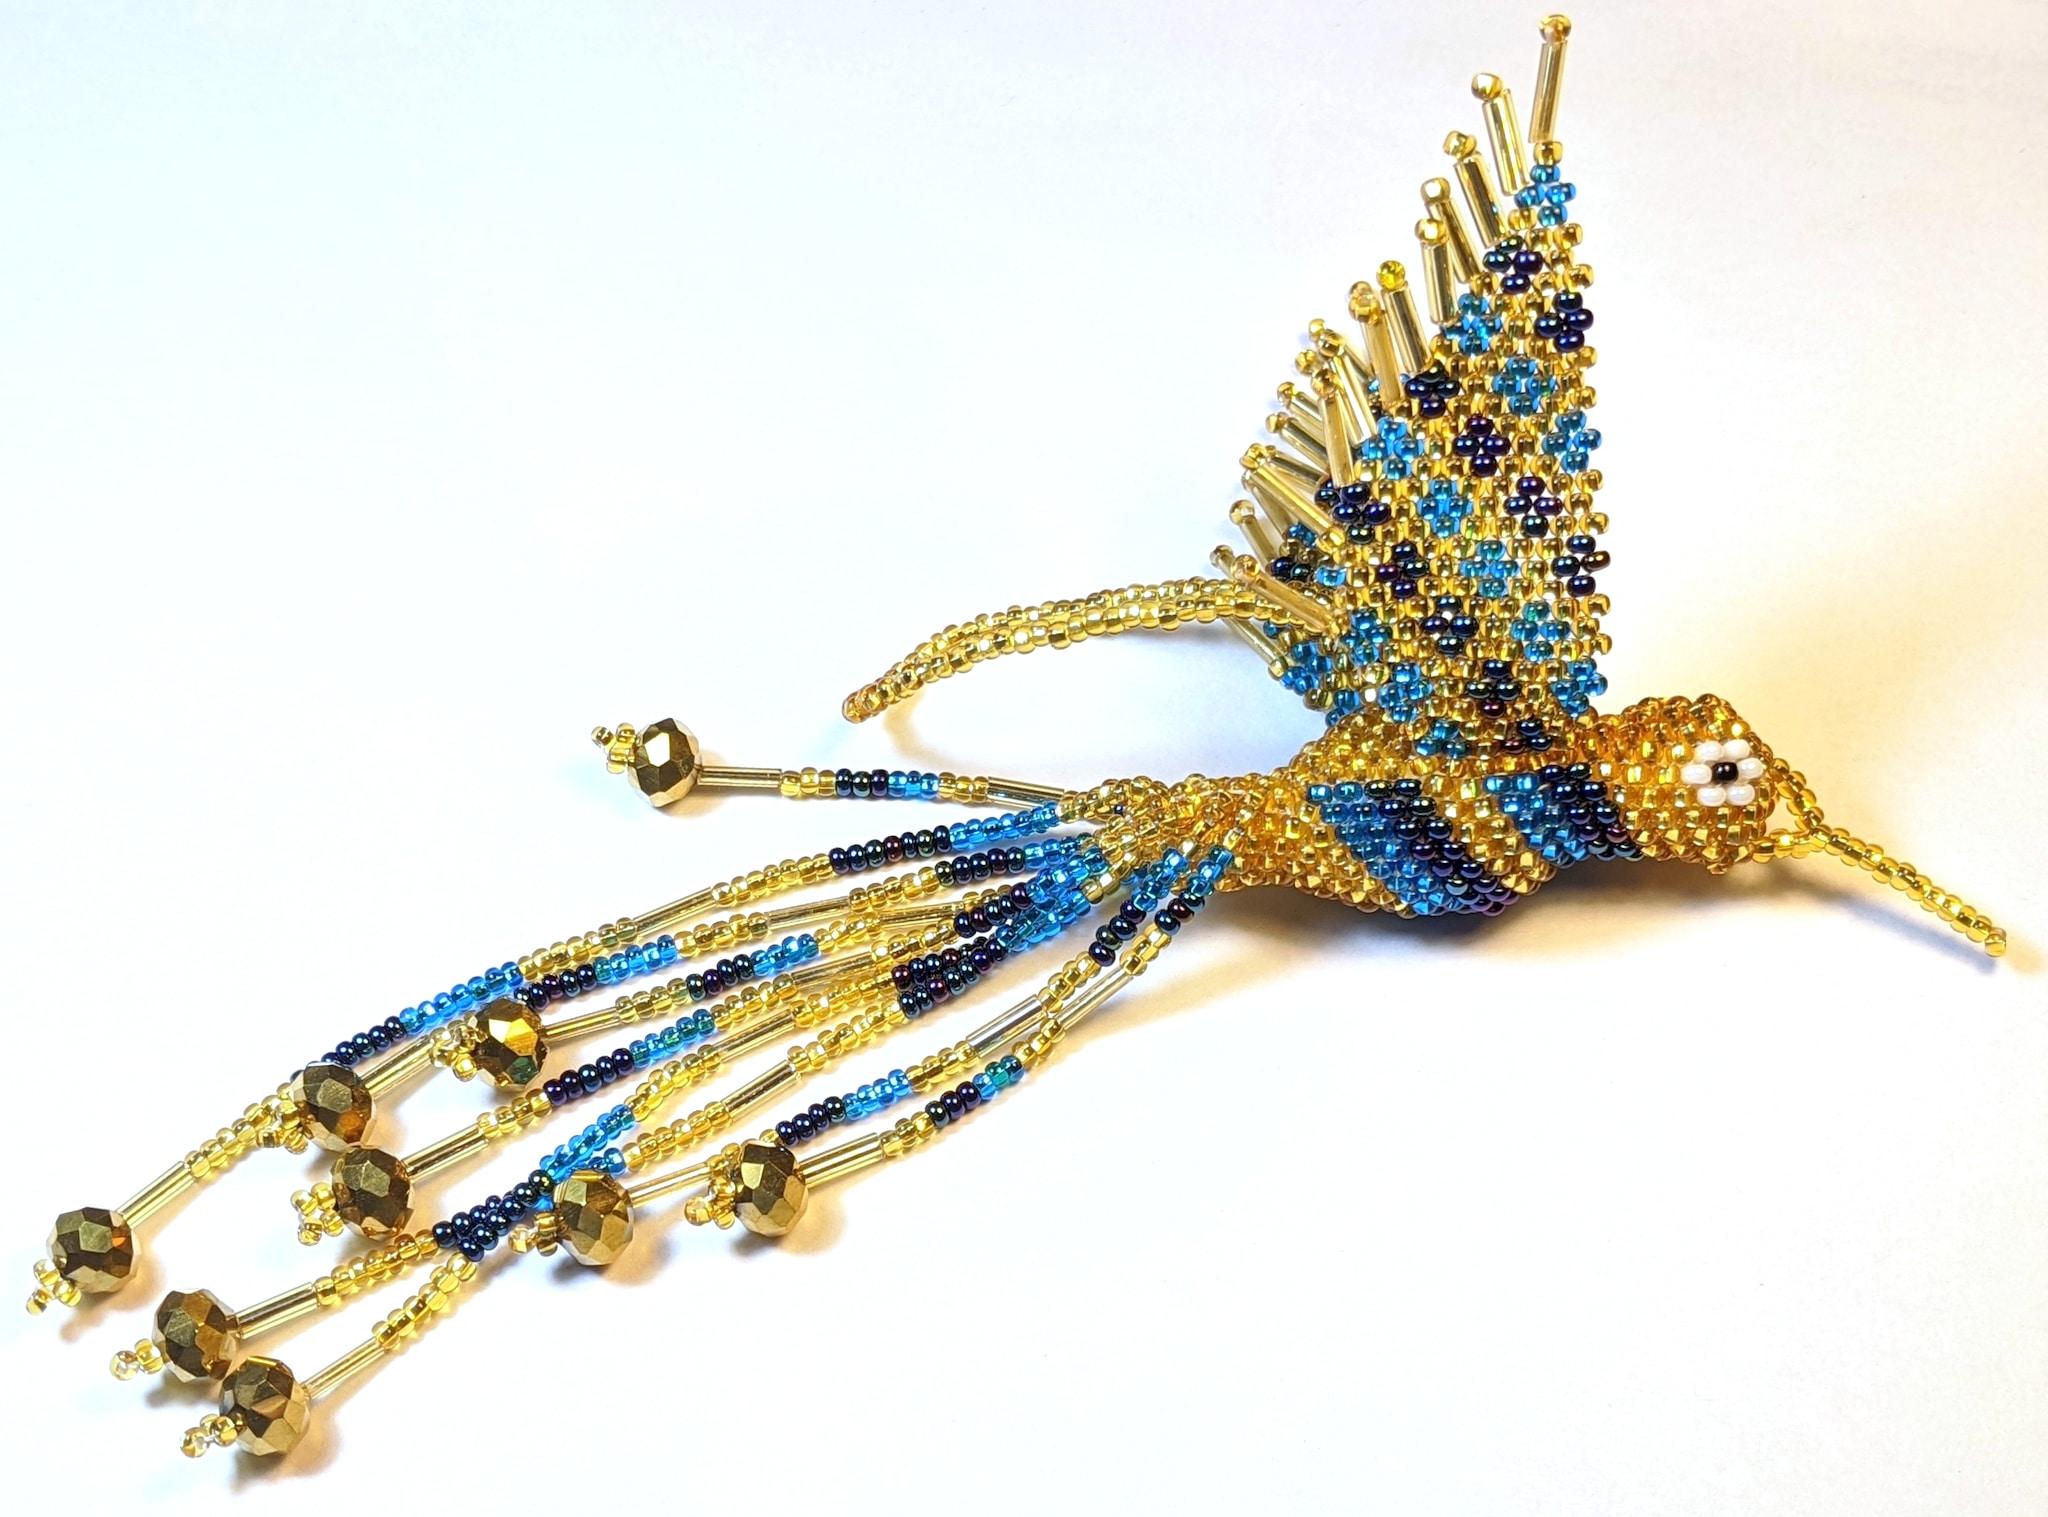 Hummingbird Beaded Ornament - Celestial Blue, Iridescent Blue, and Light Gold